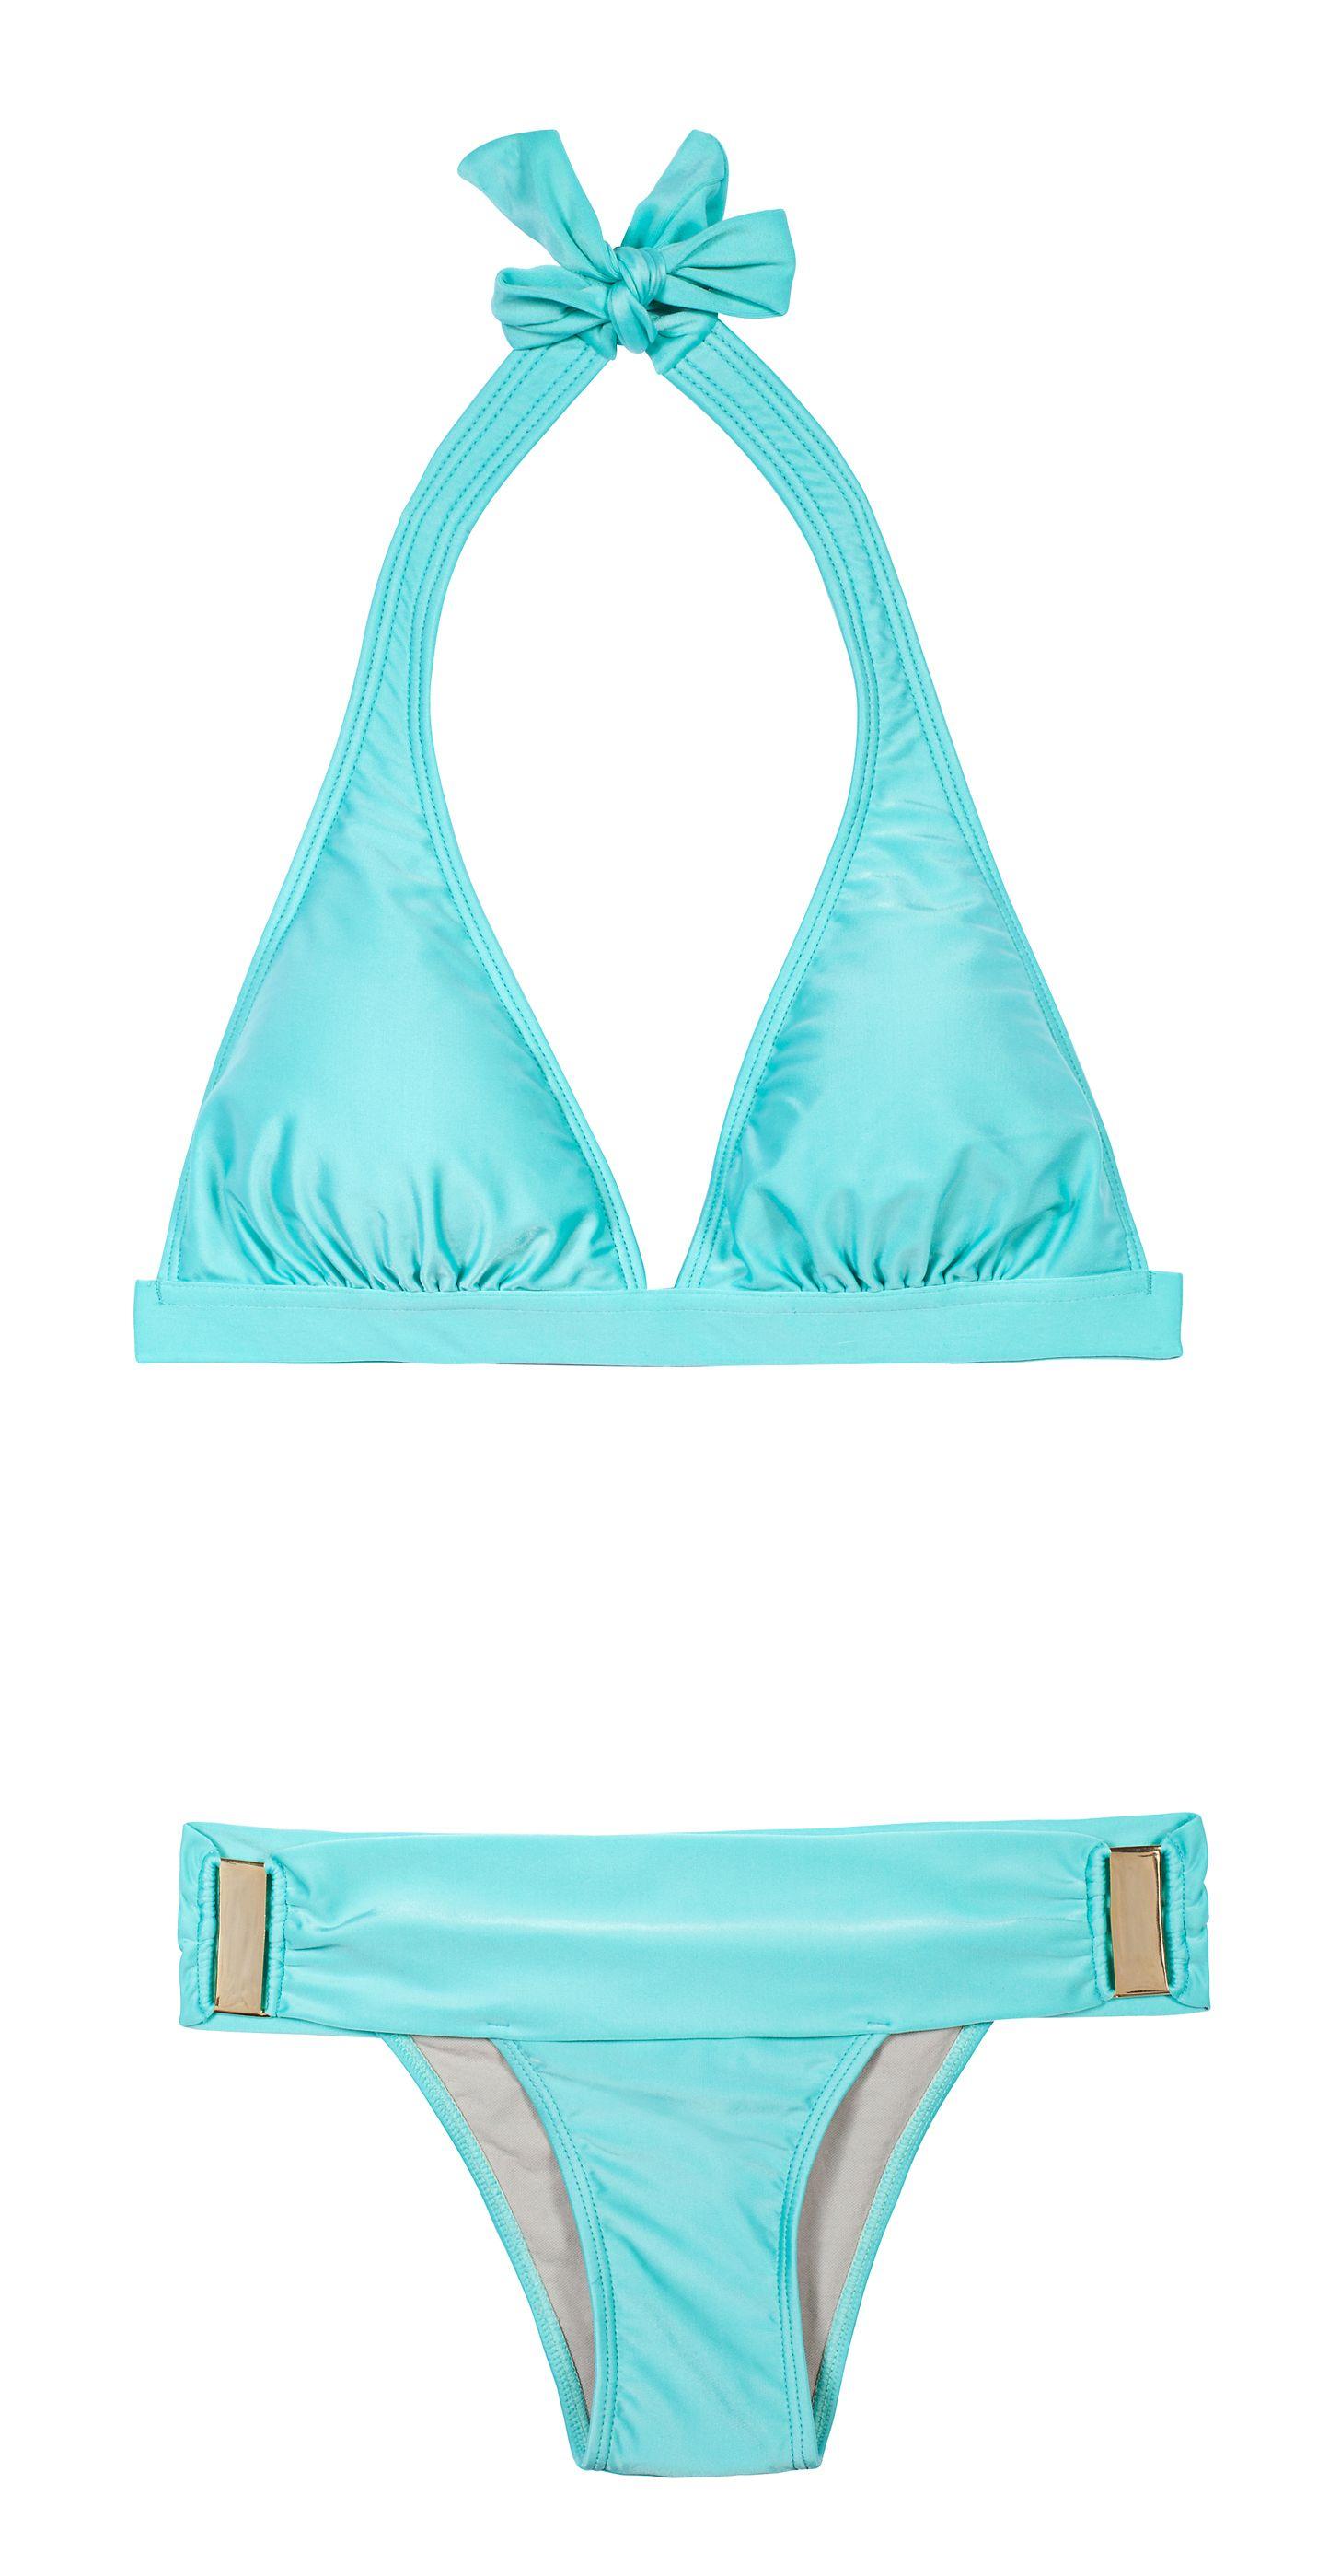 5ede6b29f4 ... #beach #brasil #brazil #praia #bikini #swimwear #summer #summertime # swimsuit #bikinis #riodejaneiro #ipanema #copacabana #beachwear  #madeinbrasil #hot